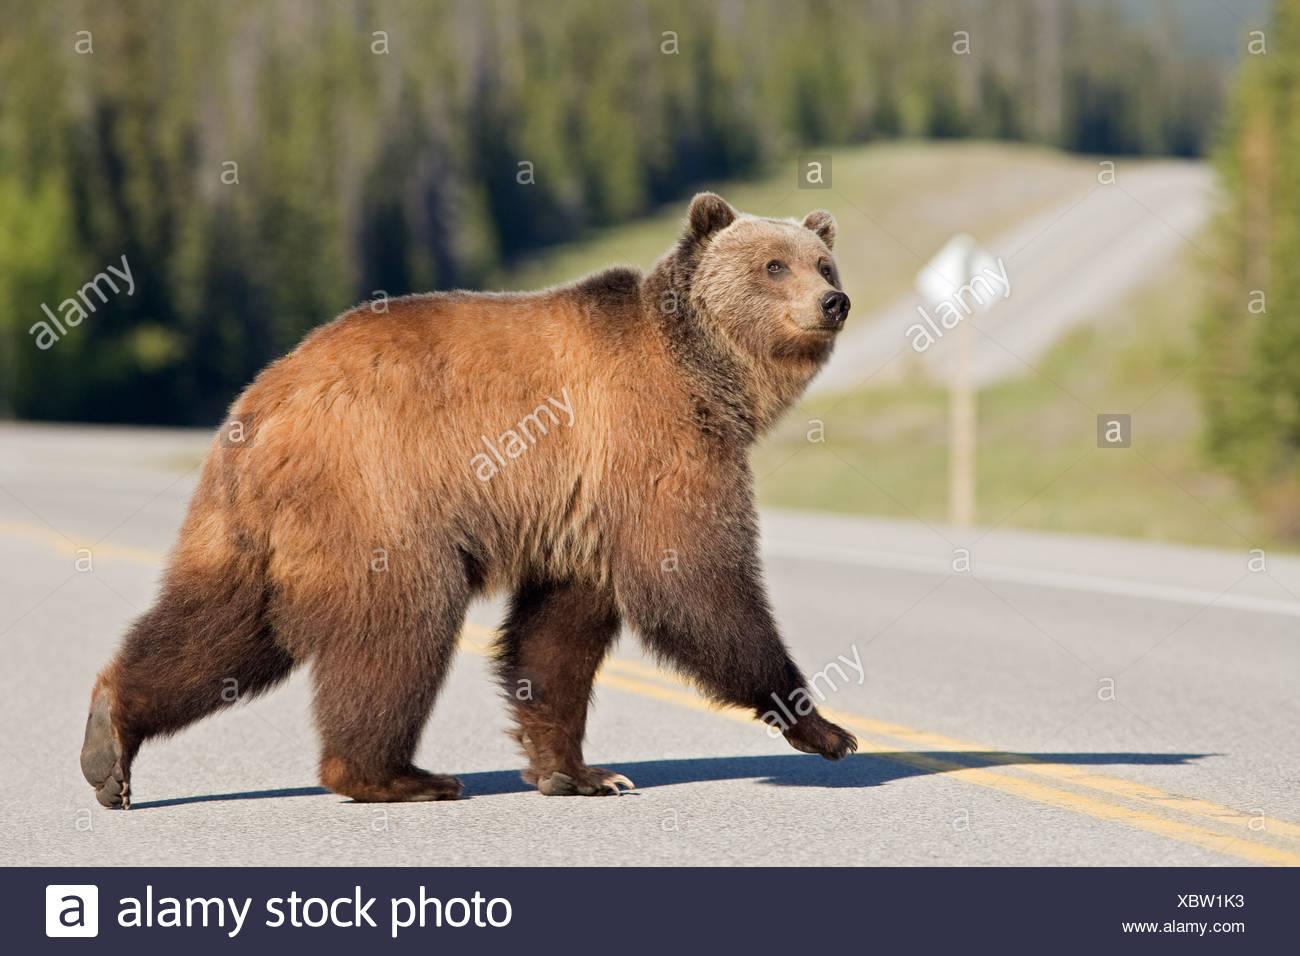 Orso grizzly (Ursus arctos horribilis) attraversando l'autostrada 11 vicino al Timber Creek, Alberta, Canada Immagini Stock